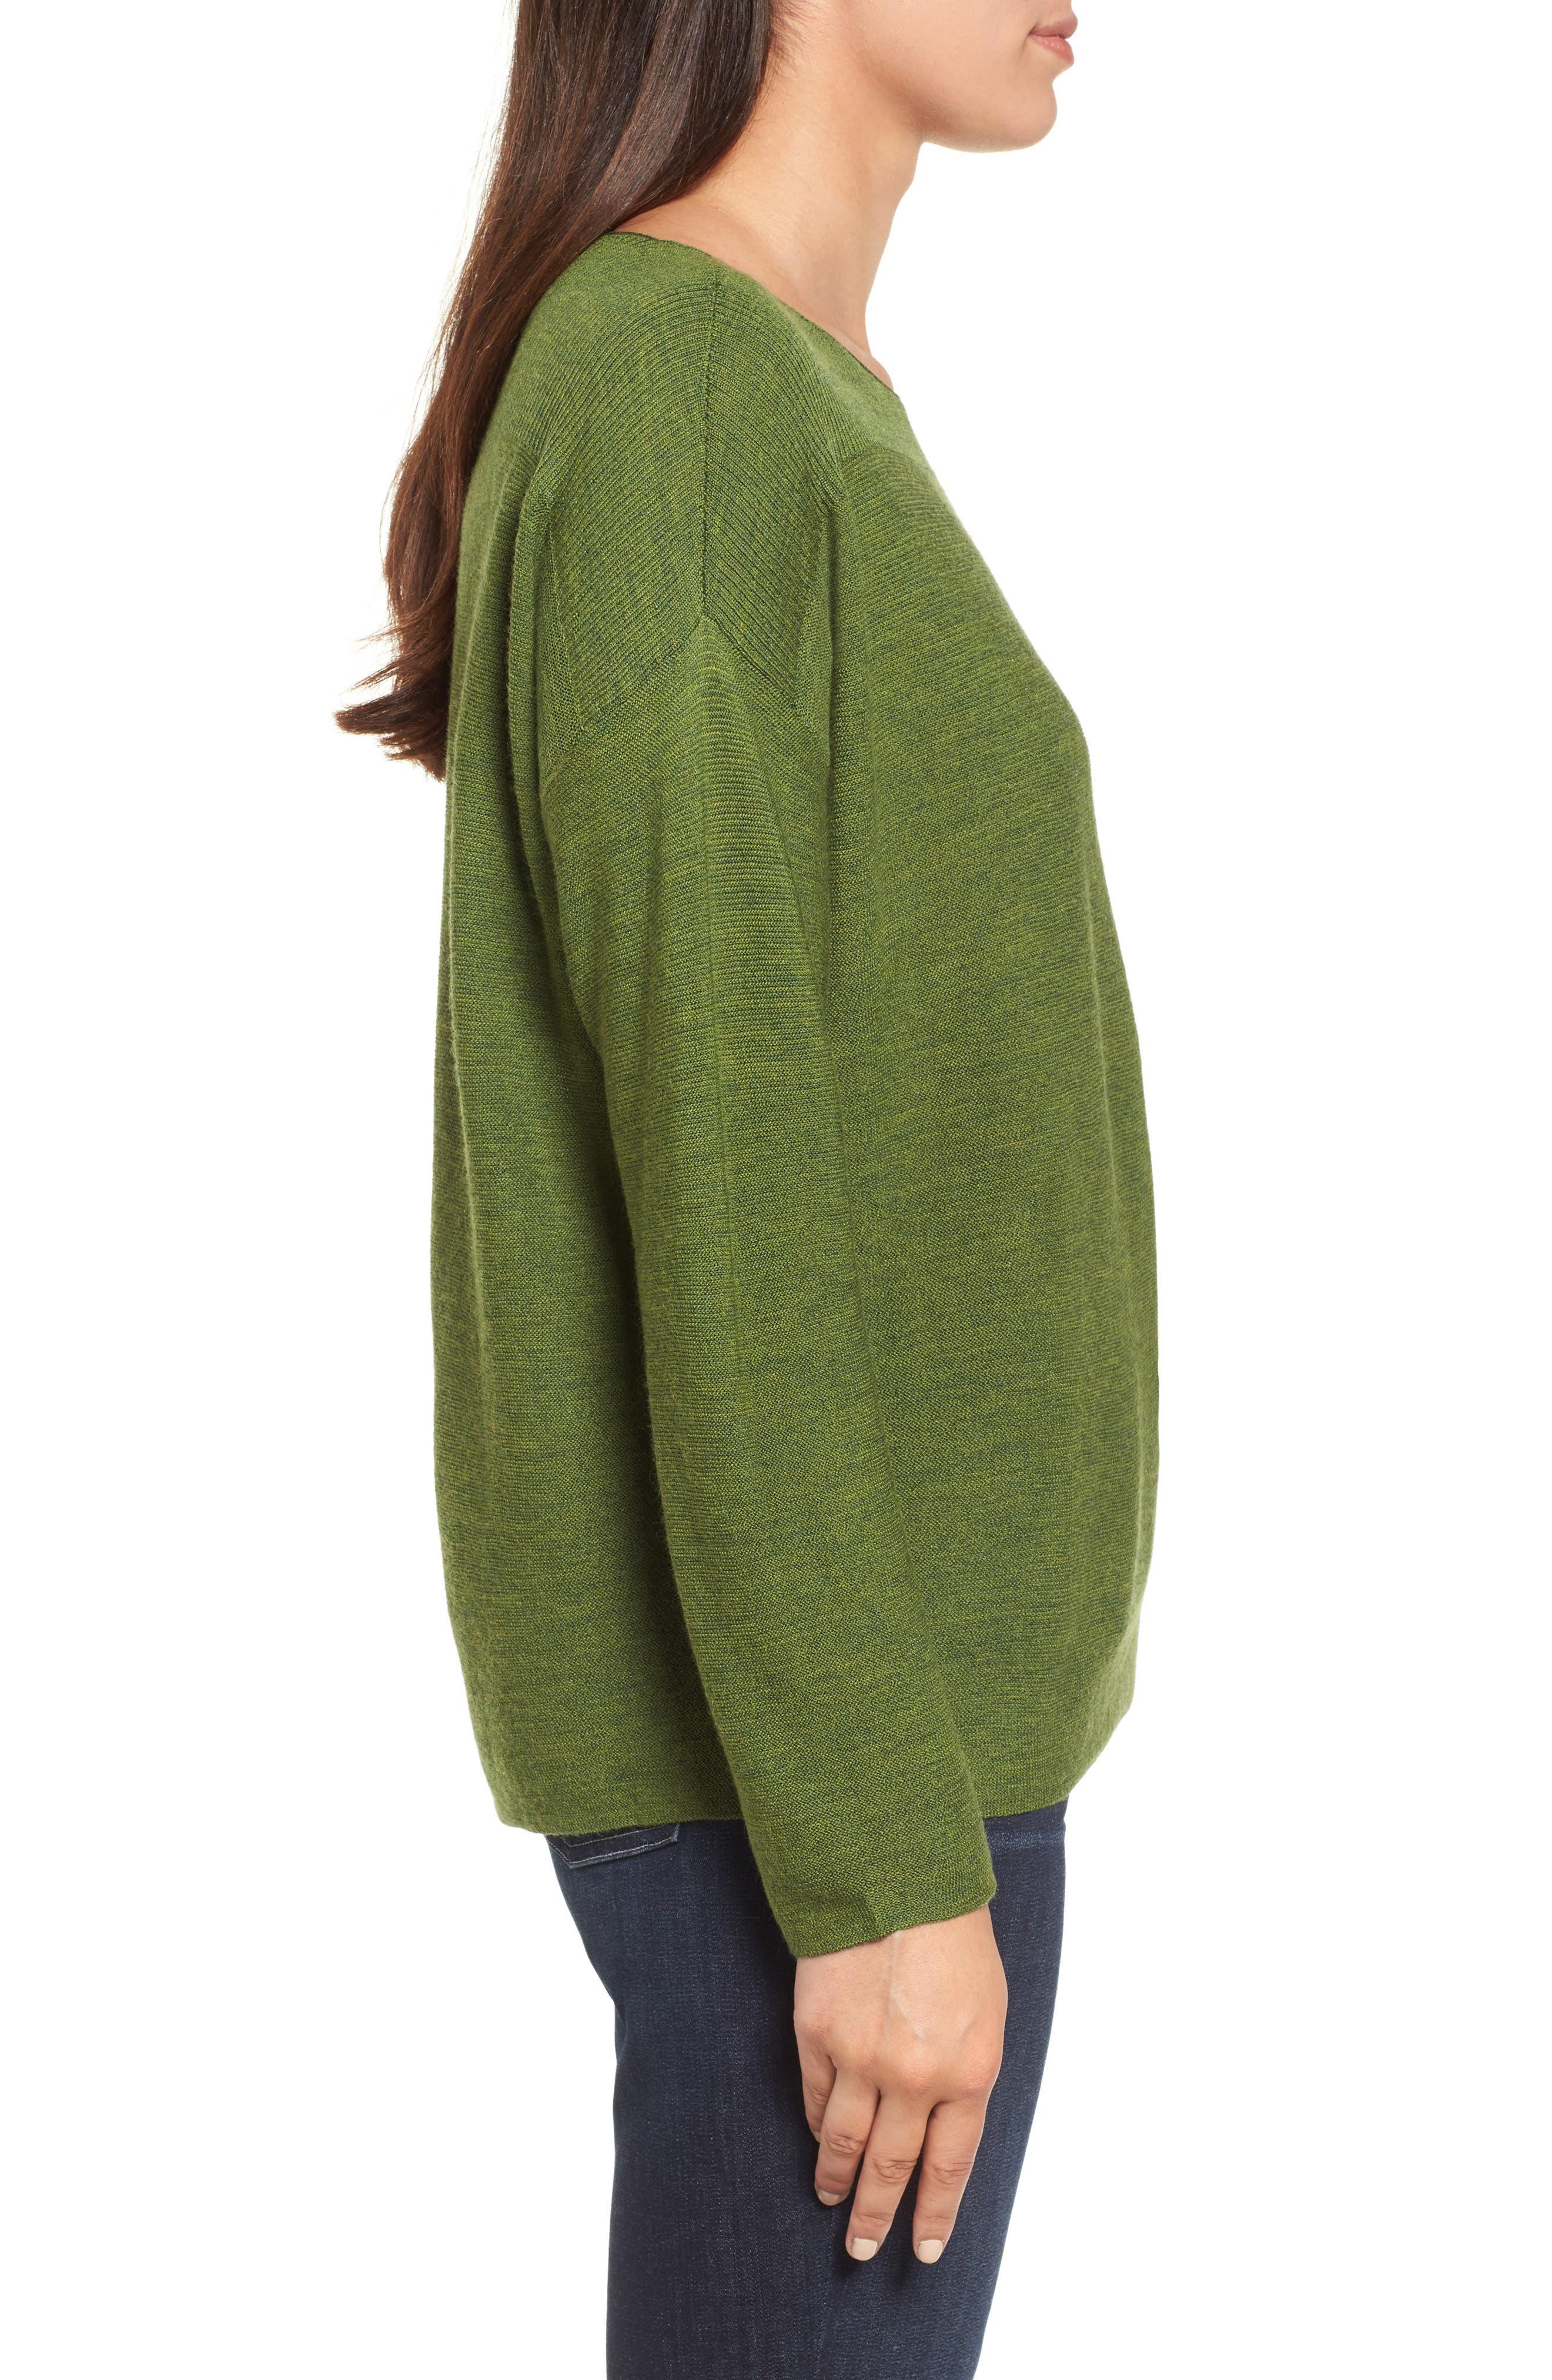 Alternate Image 3  - Eileen Fisher Mix Stitch Merino Bateau Neck Sweater (Regular & Petite)